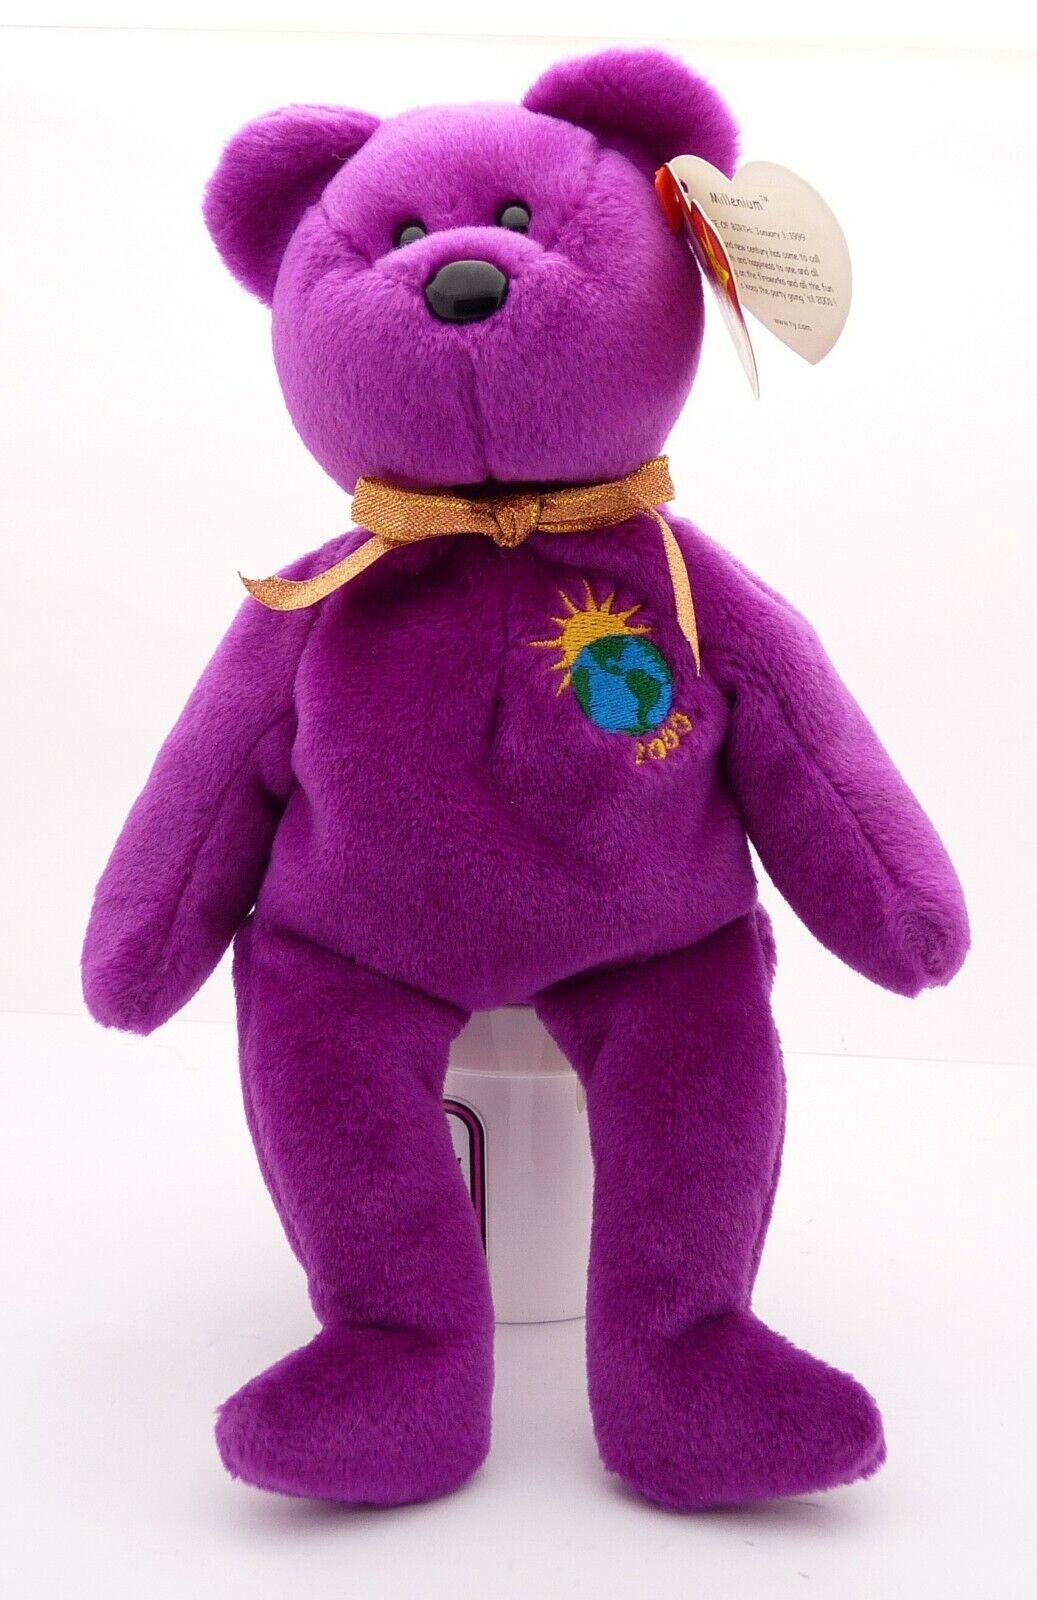 TY Original BEANIE BABY MILLENIUM BEAR BEAR BEAR January 1 1999 MISSPELLED NAME TAG ERROR ad2ff7